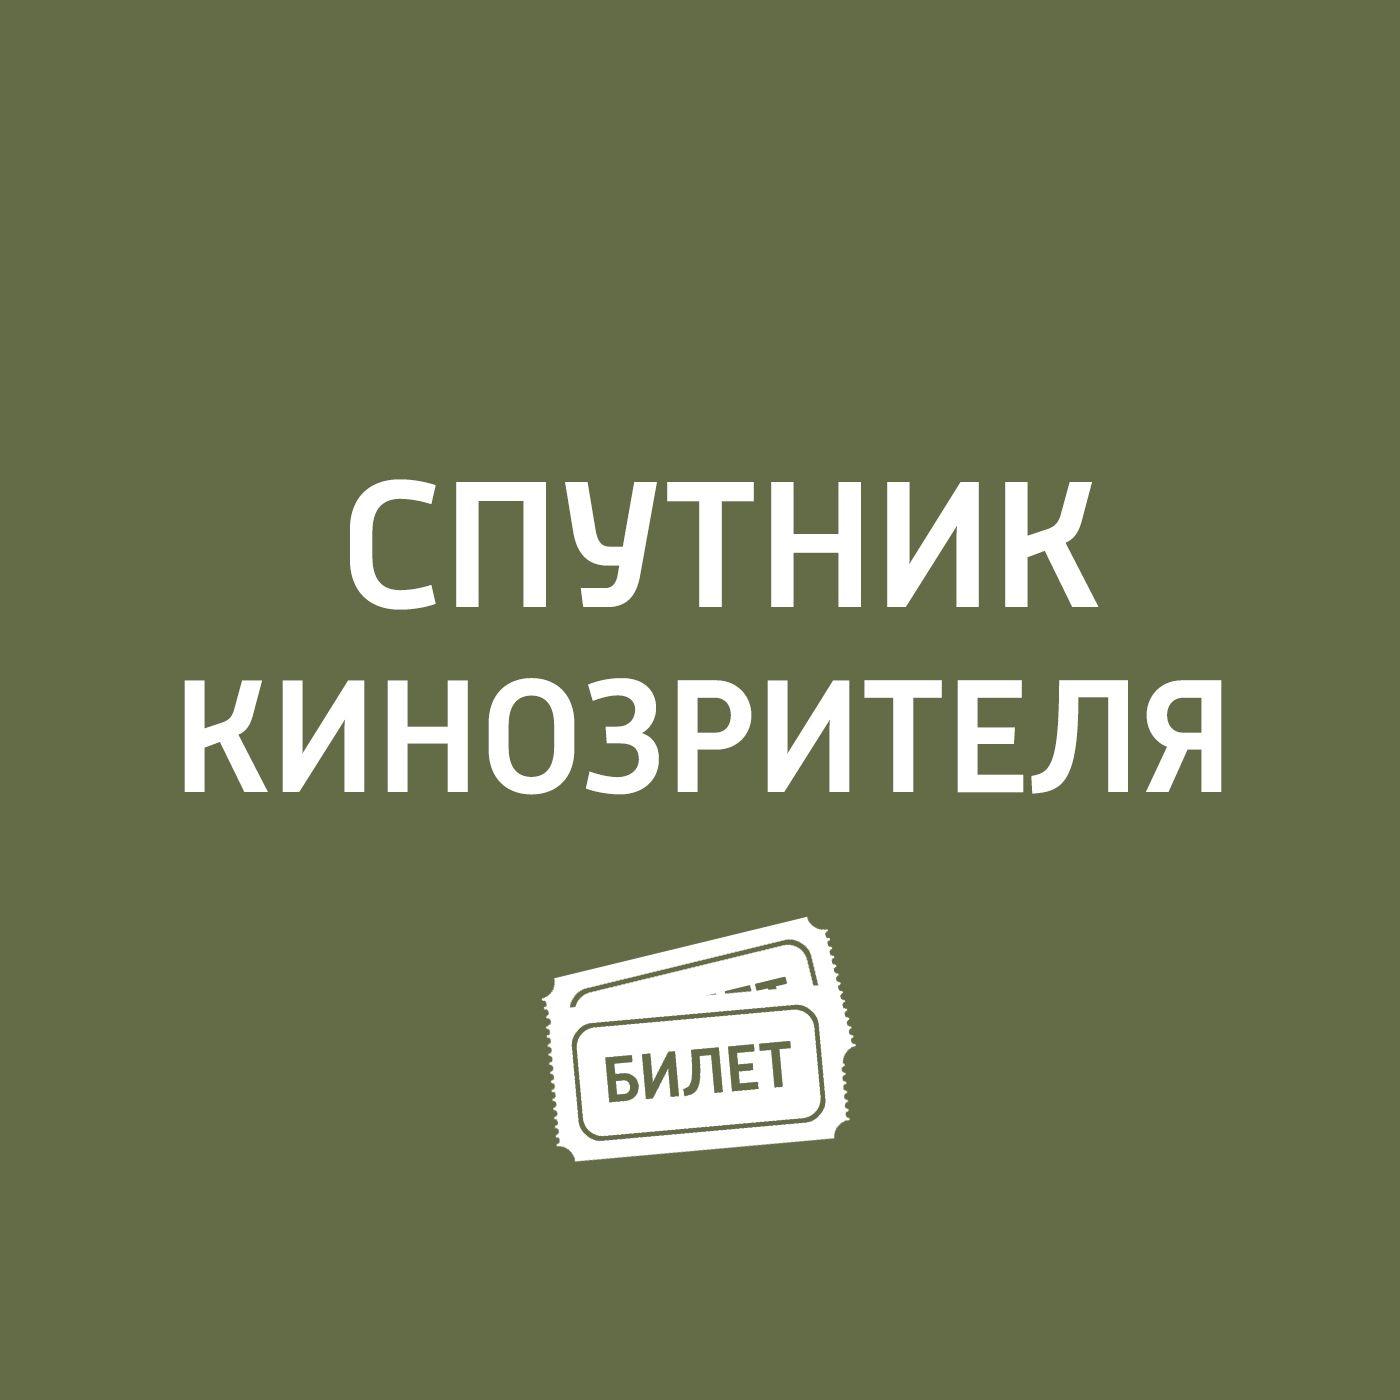 Антон Долин Антон Долин о Георгии Данелия антон долин сладкая жизнь